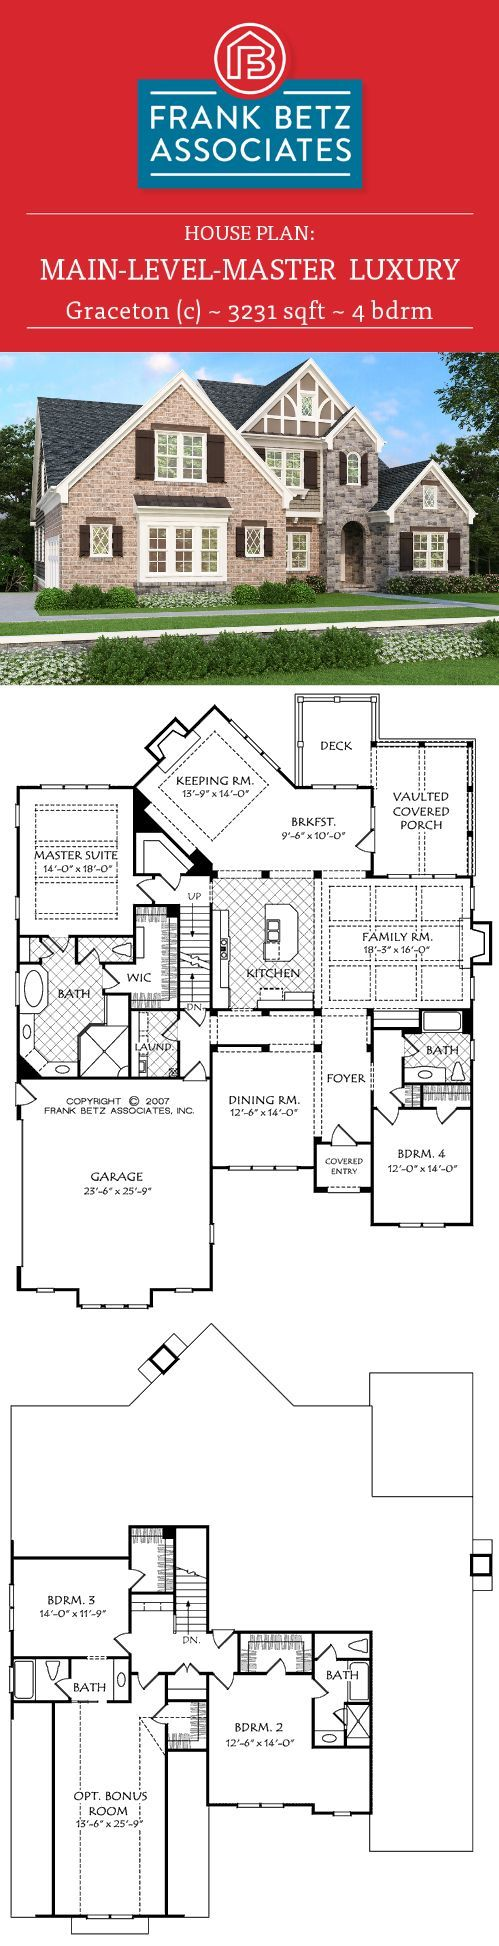 Graceton c 3231 sqft 4 bdrm luxury